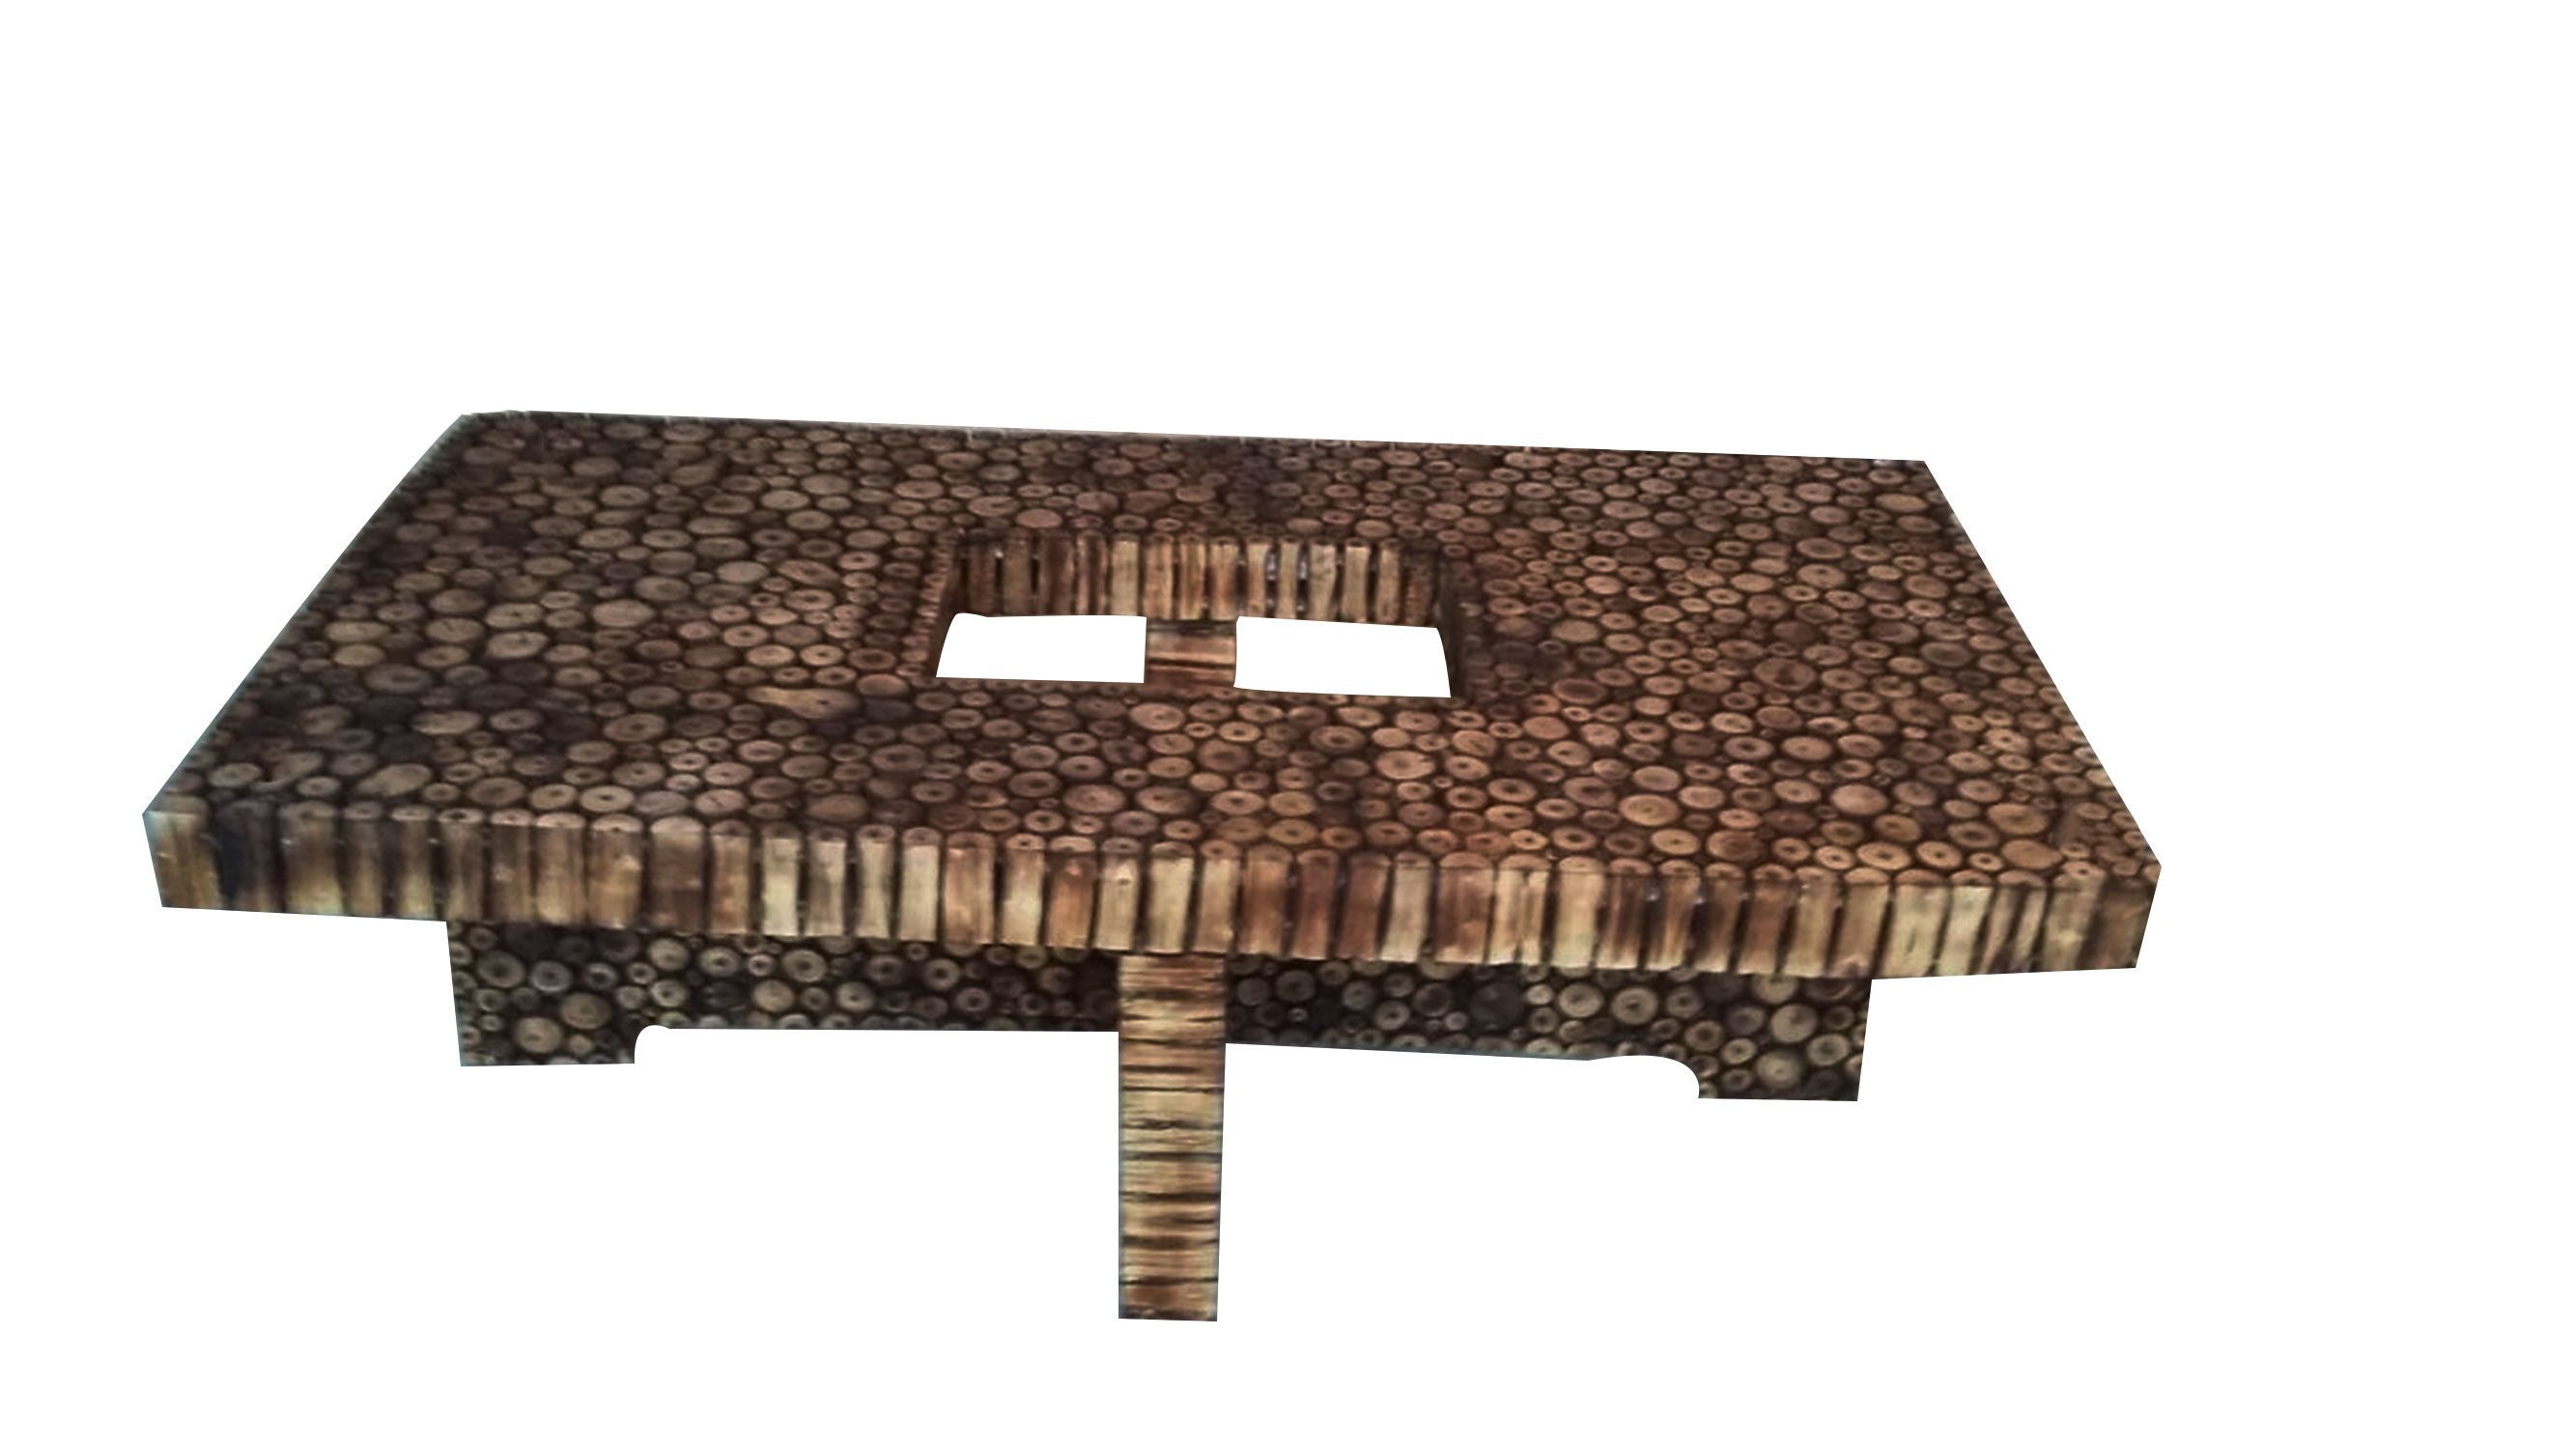 wooden handmade furniture - hm17